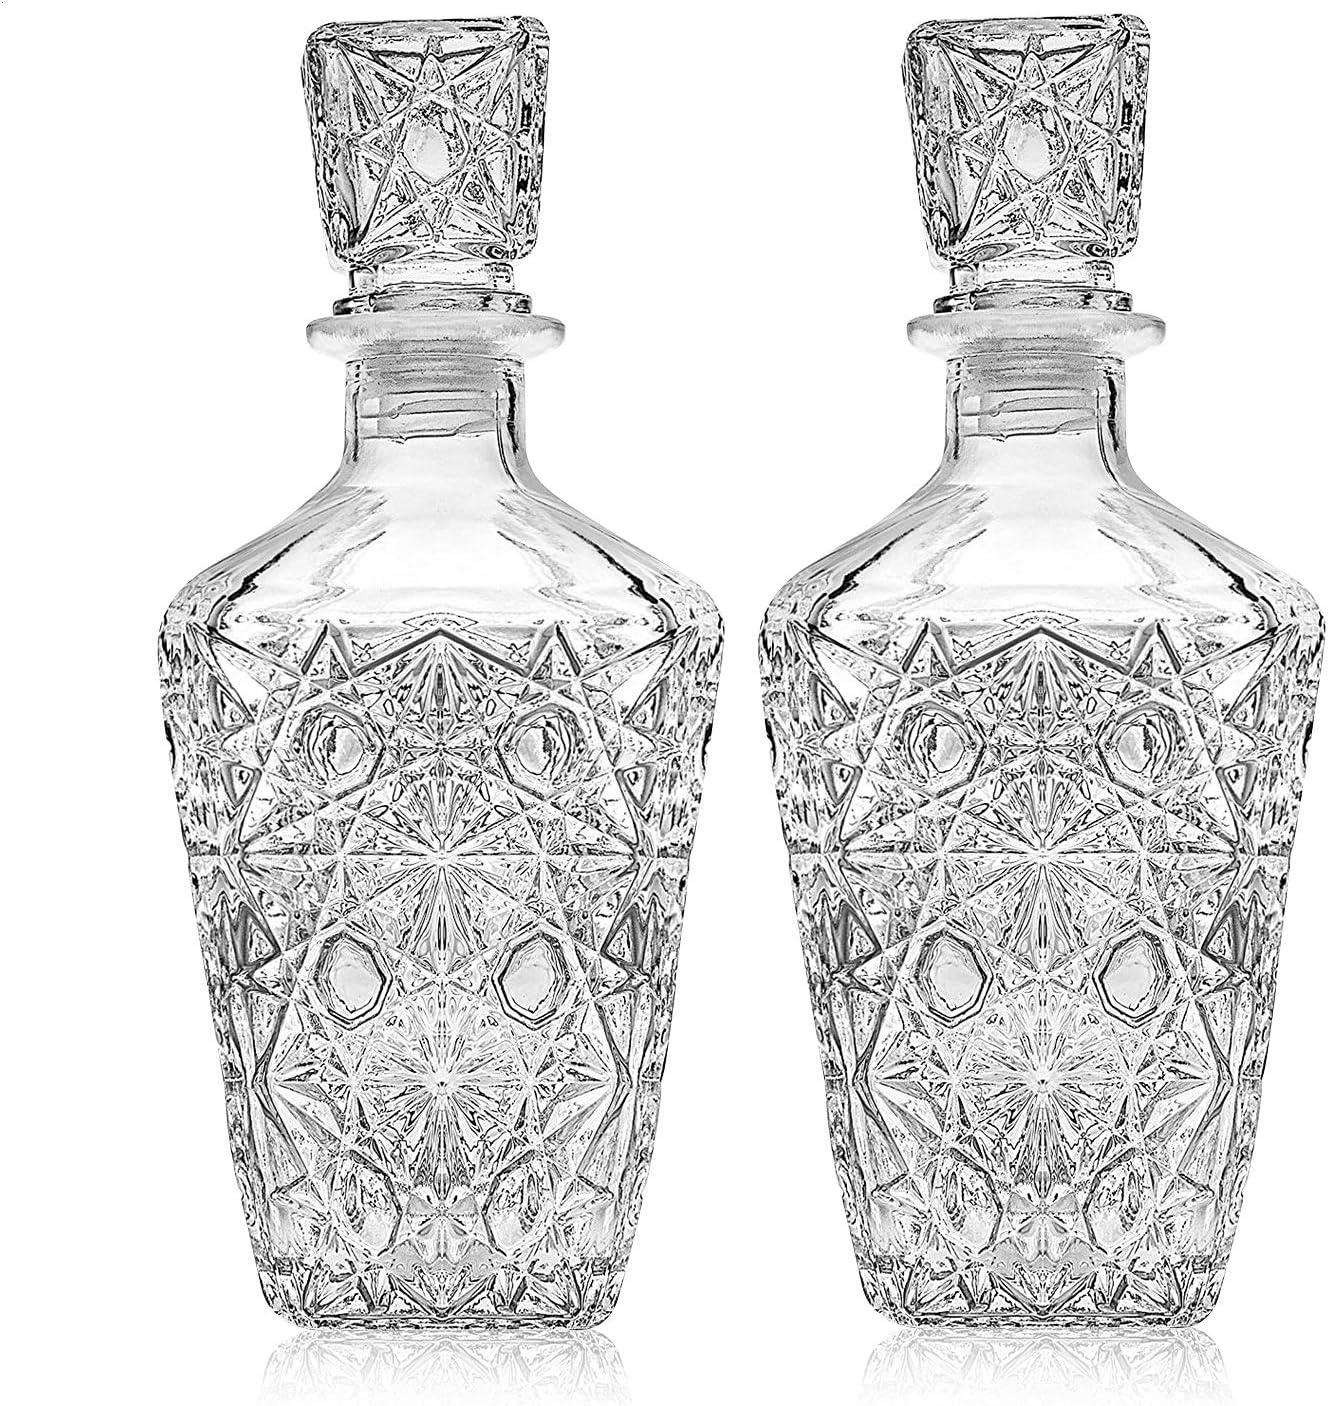 Whiskey Decanter – Elegant Liquor Decanter Set – Glass Liquor Bottle for Whiskey, Tequila and Brandy – Sophisticated Sparkling Design – Set of 2 Premium Decanters for Alcohol